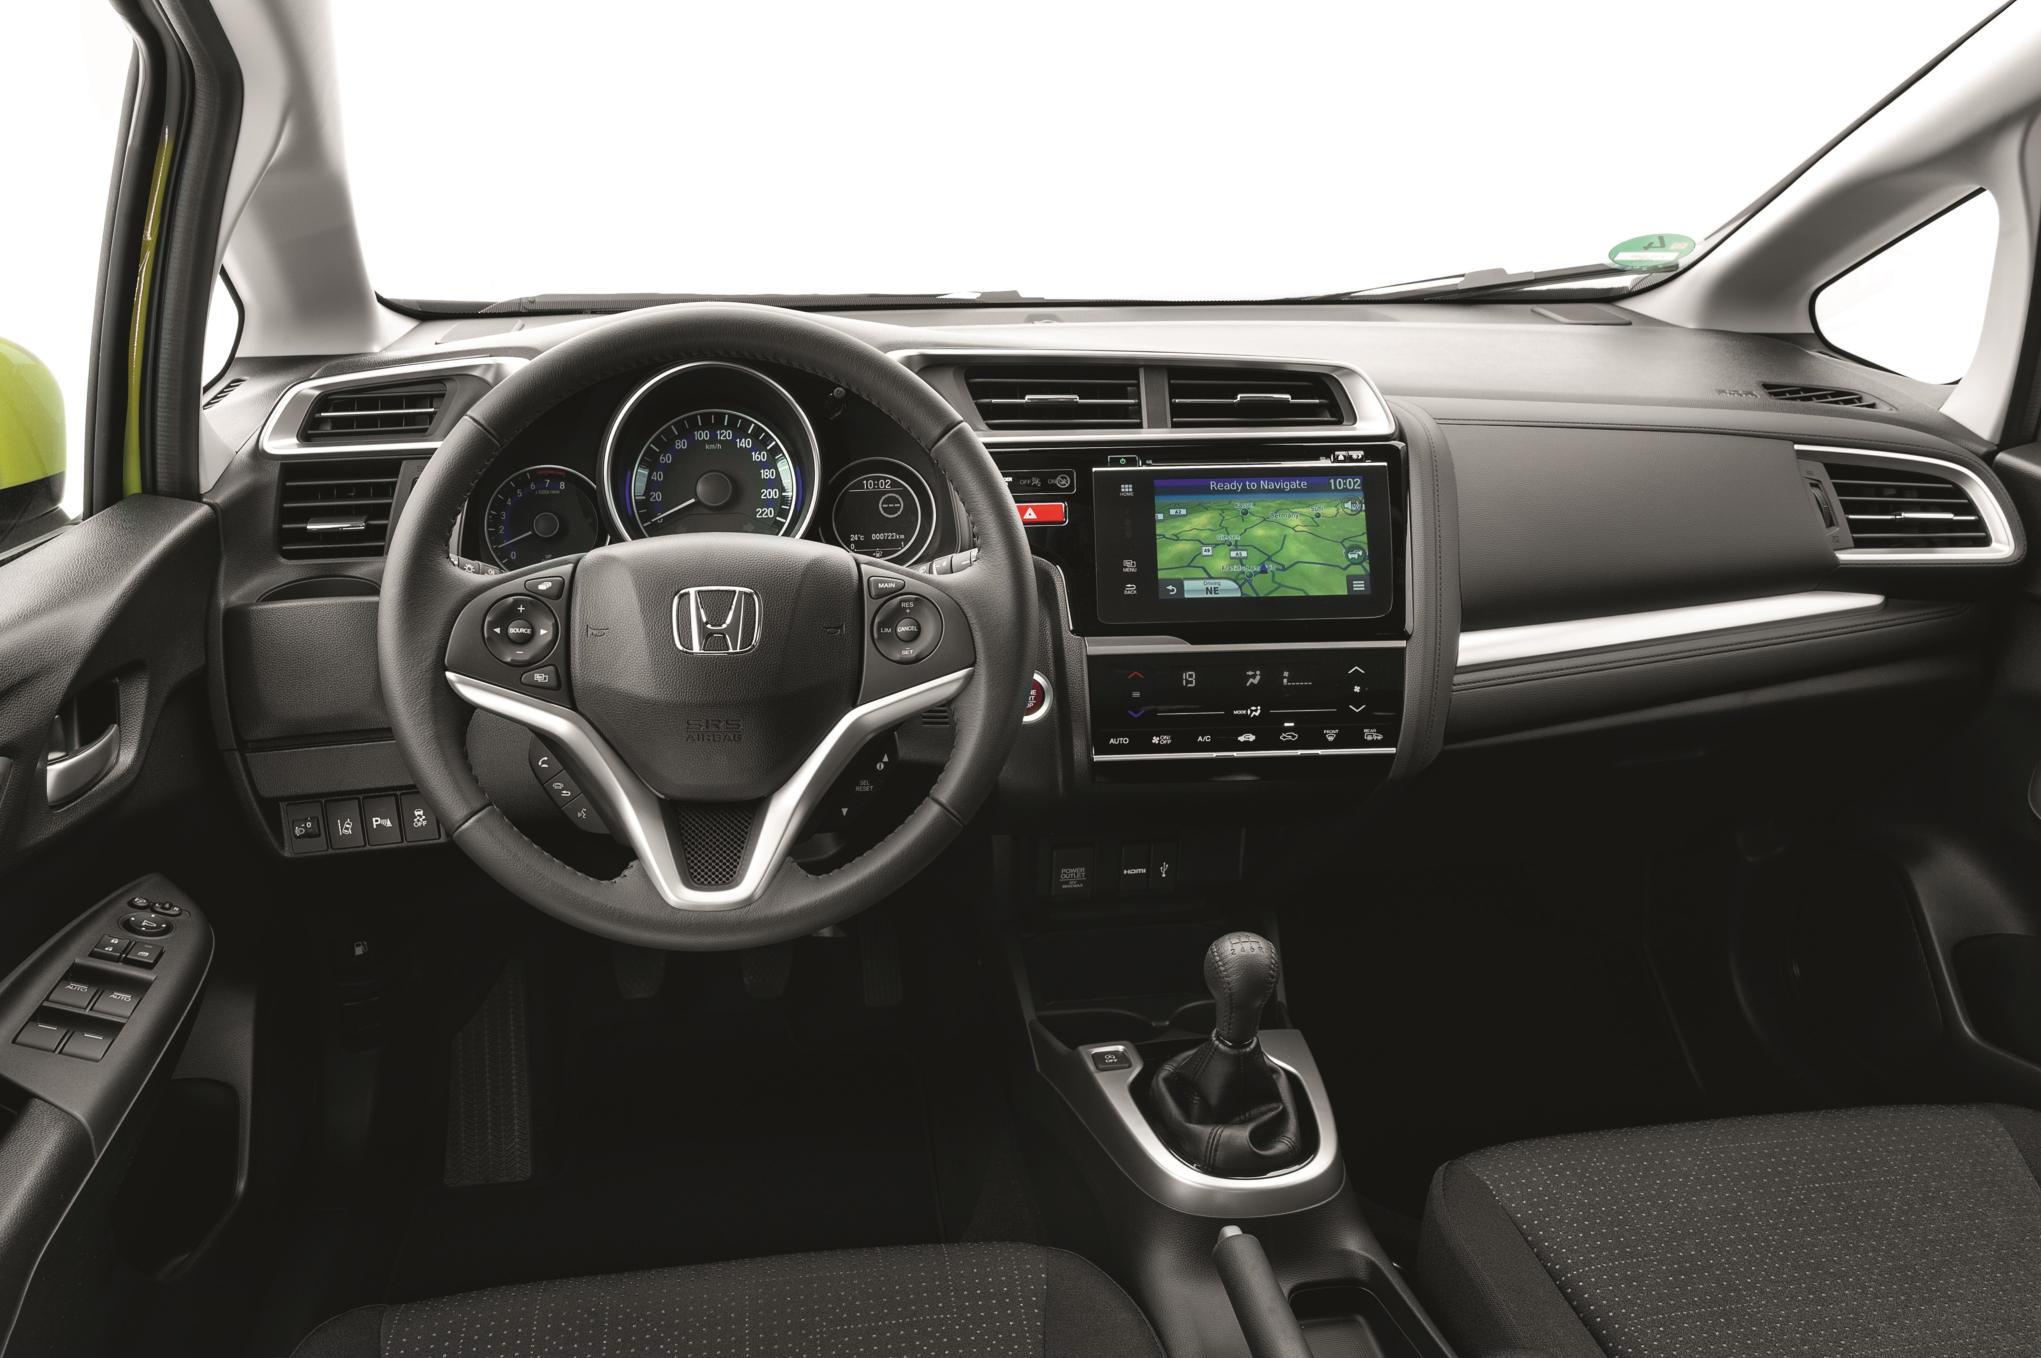 Honda Jazz 2015: Disponible a patir de Septiembre con el 1.3 i-VTEC 3